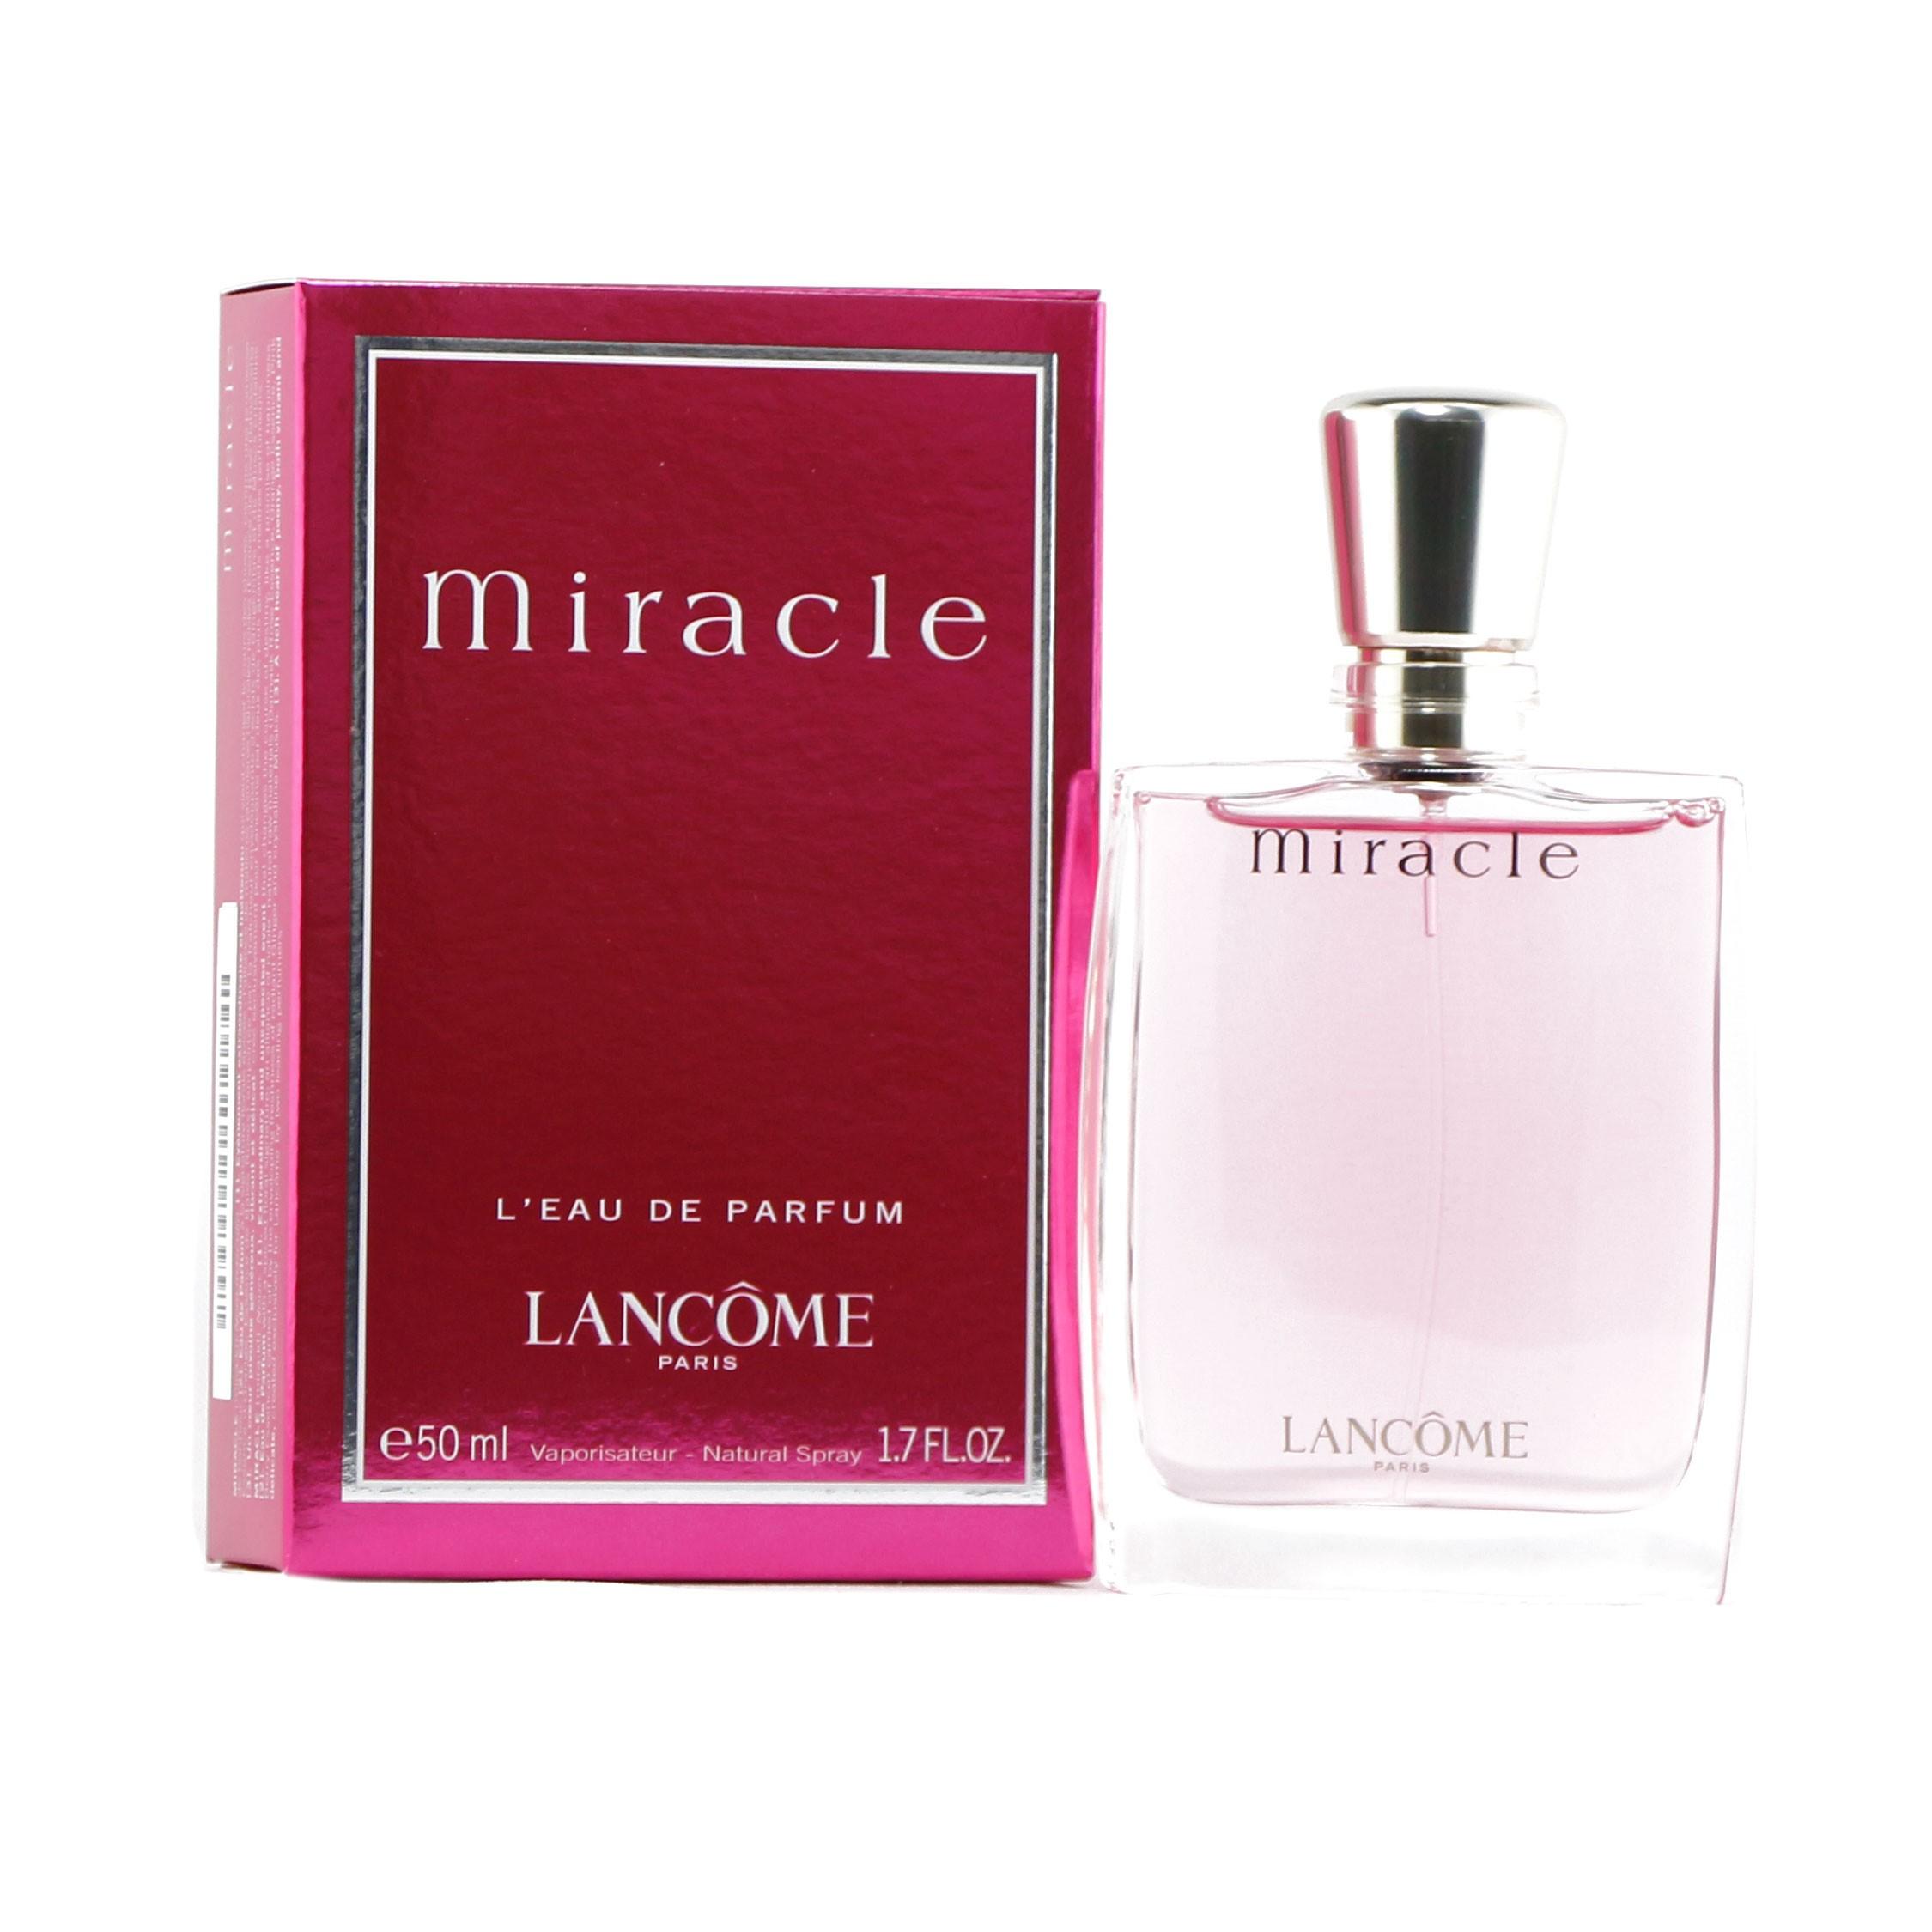 18215a62e4a8ca Lancôme Miracle - Eau De Parfum Spray | beautyPALAST.ch